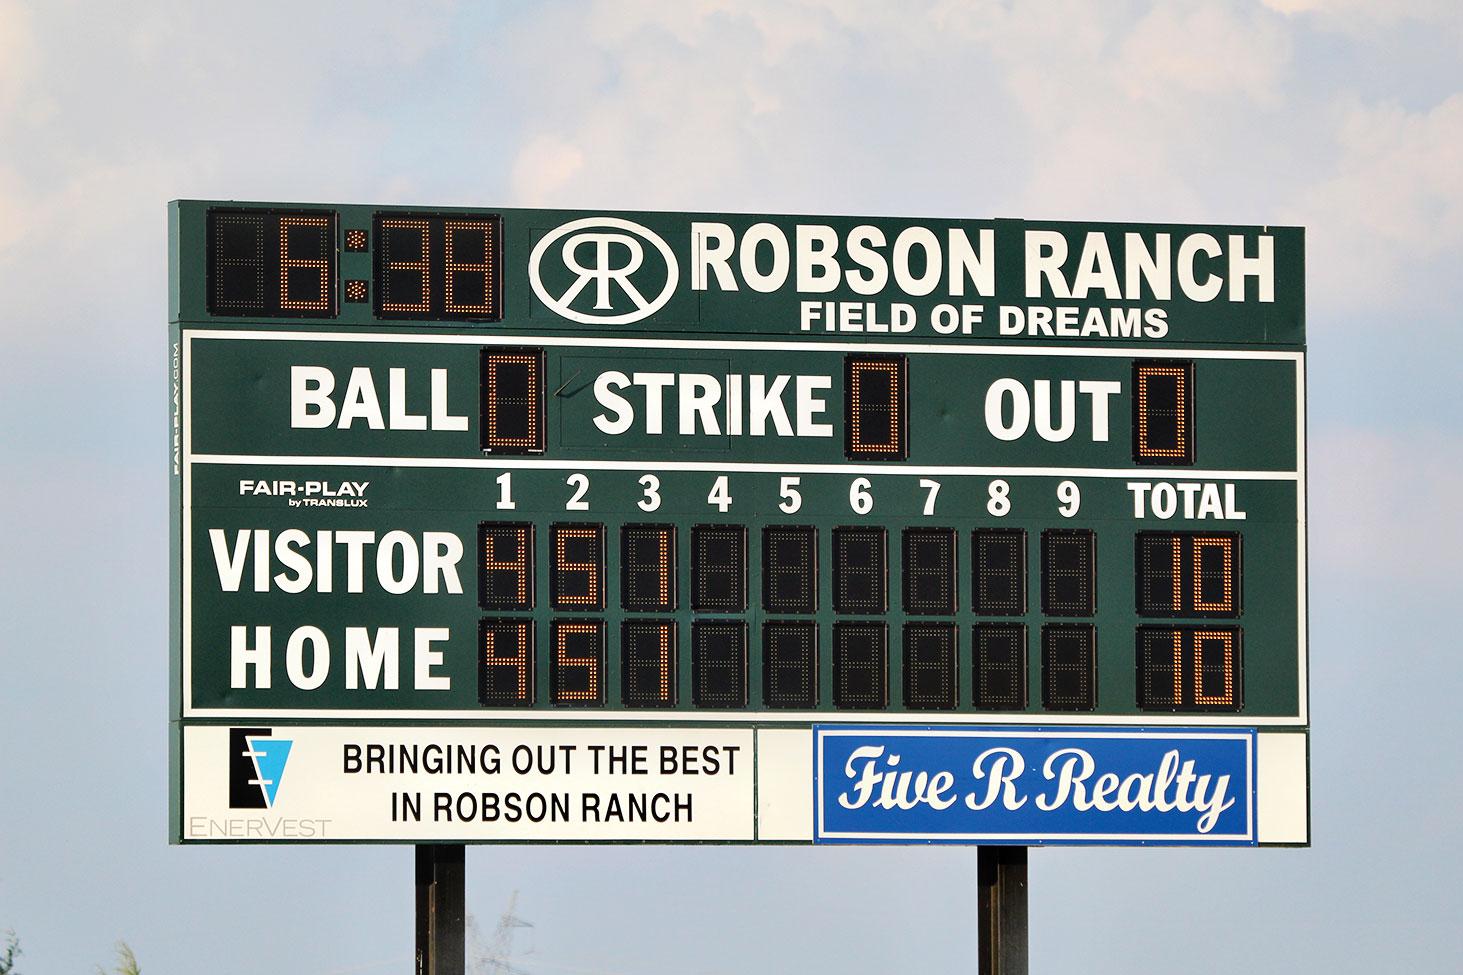 The Robson Ranch softball scoreboard